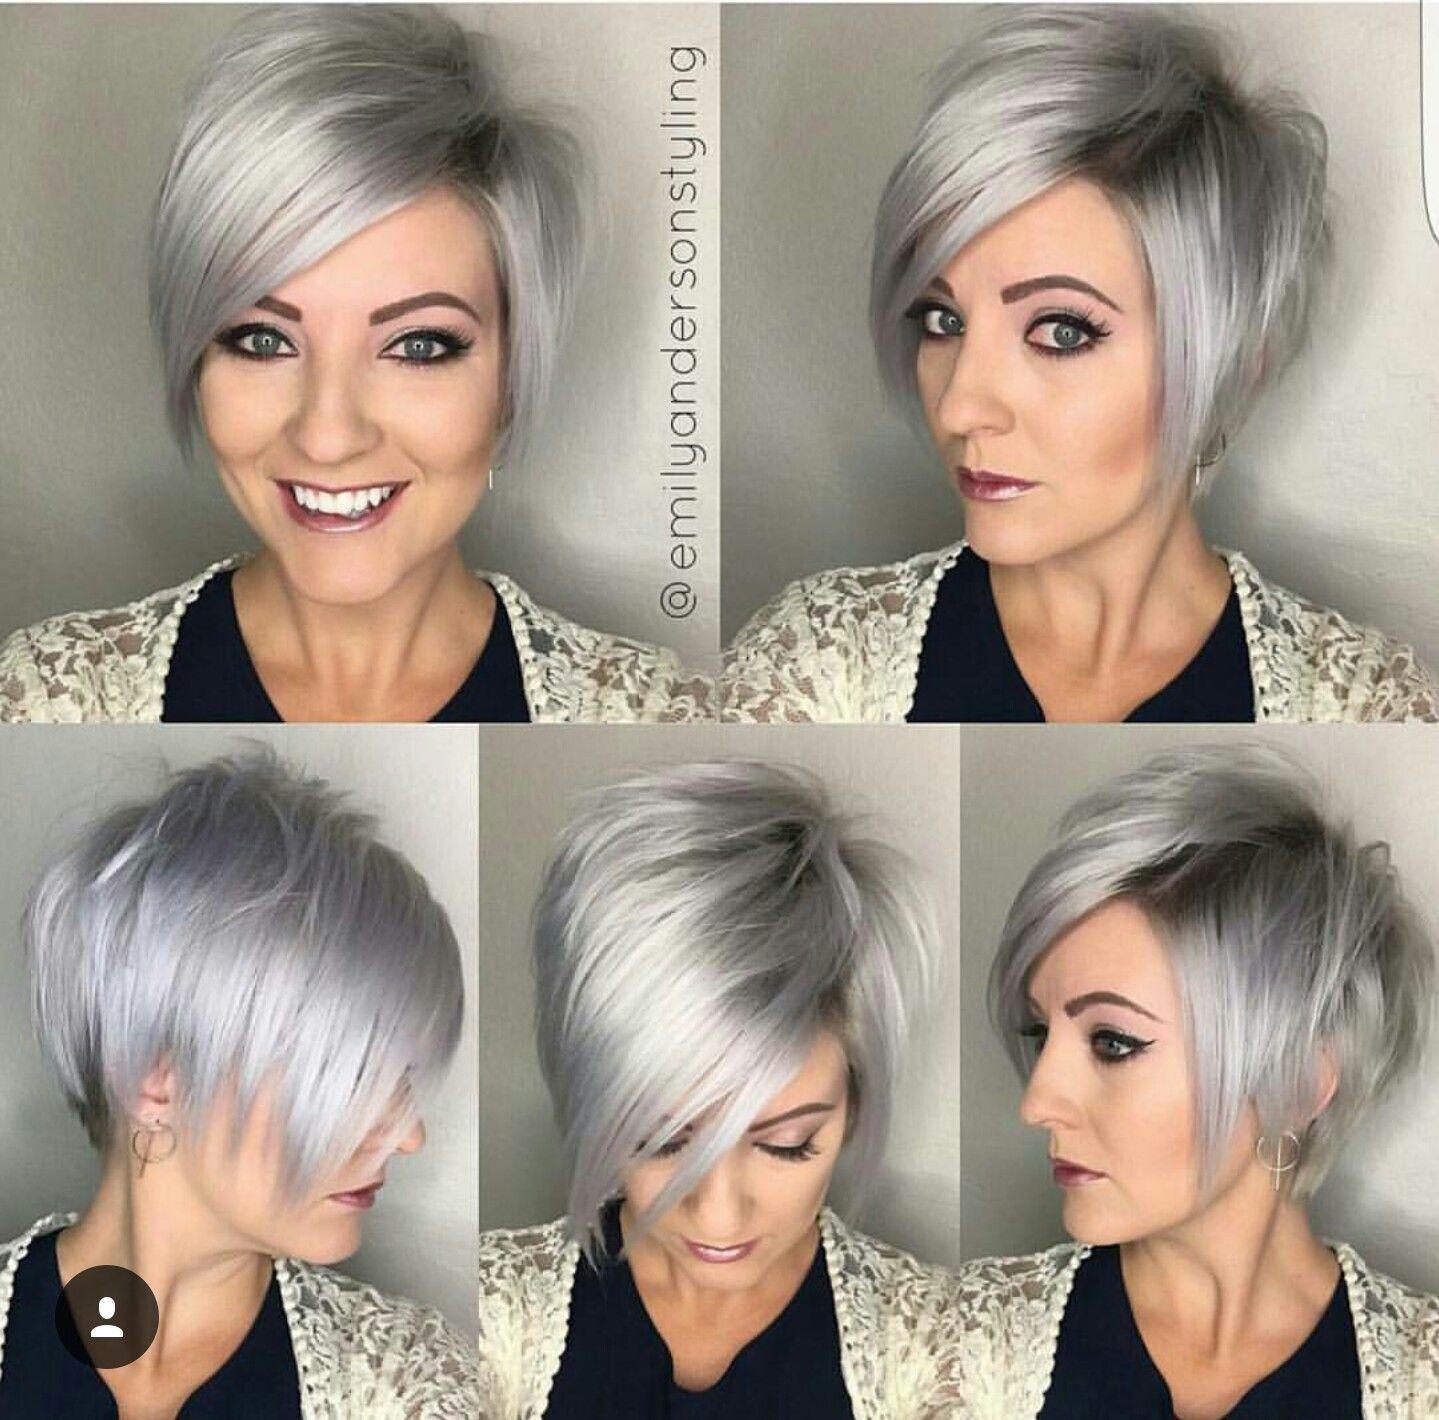 Beautiful cabello y belleza pinterest short hair hair cuts